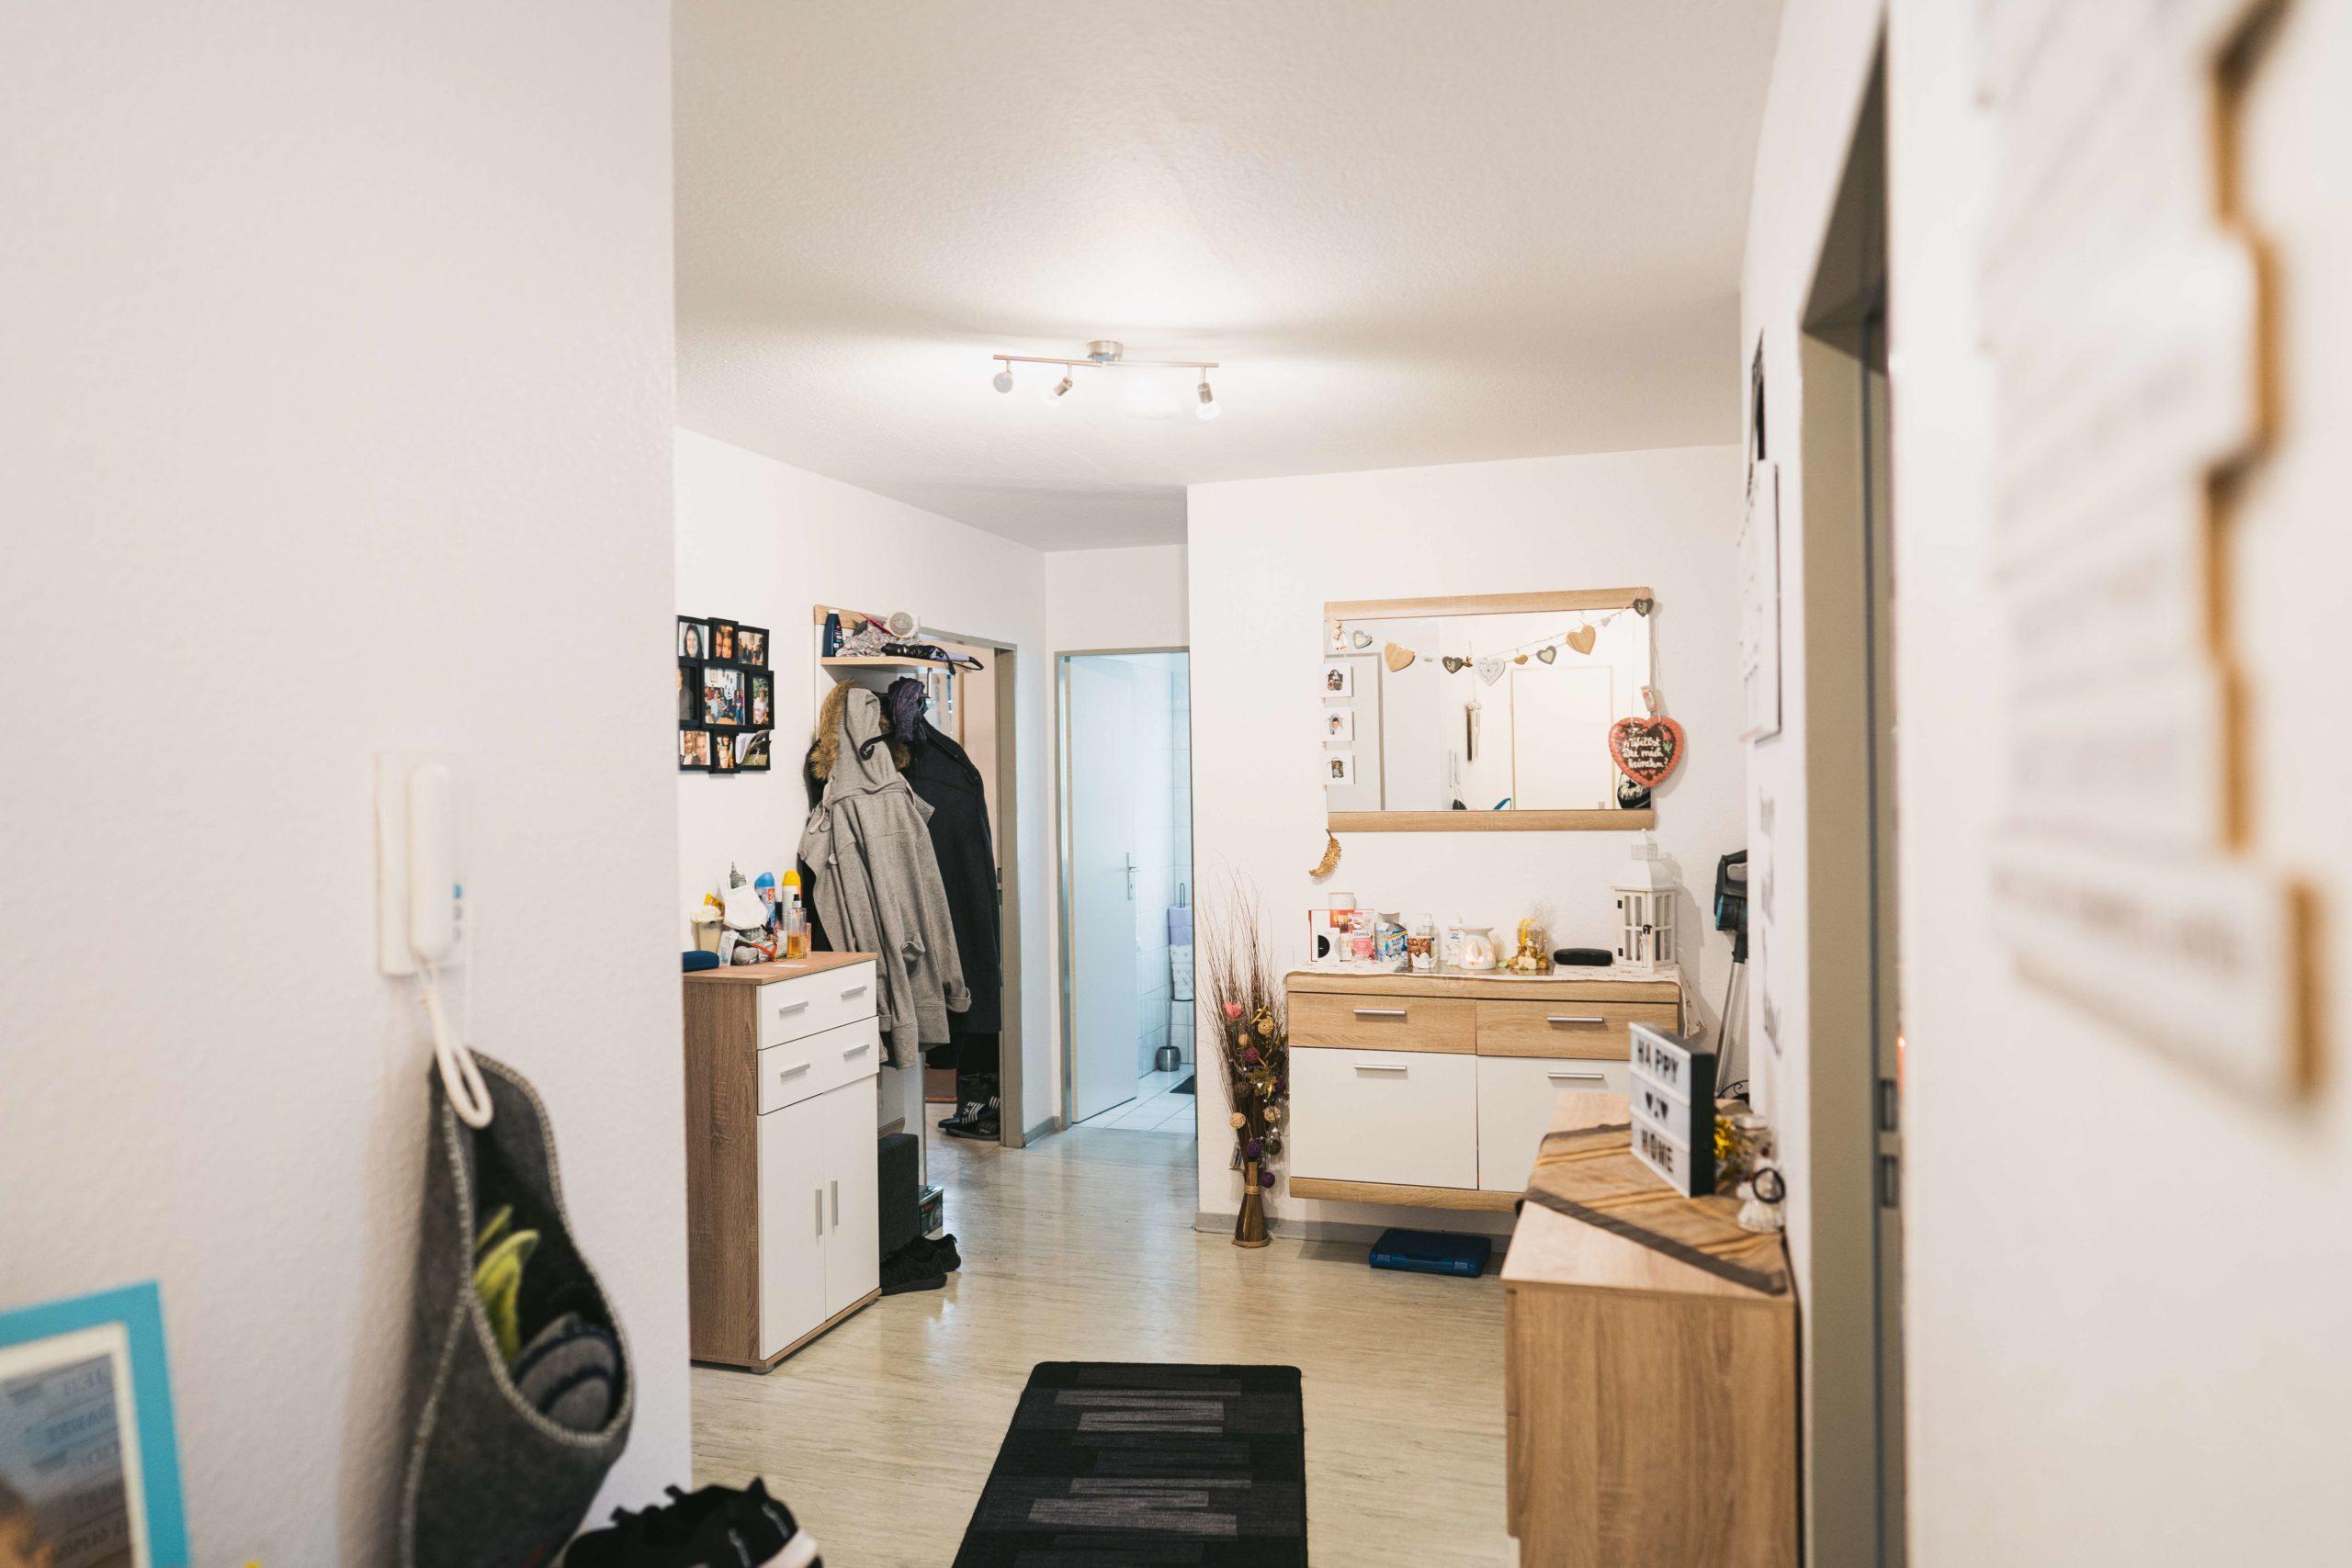 Kaiserslautern Eastside Apartments Immobilie zur Kapitalanlage Wohnung kaufen in Kaiserslautern